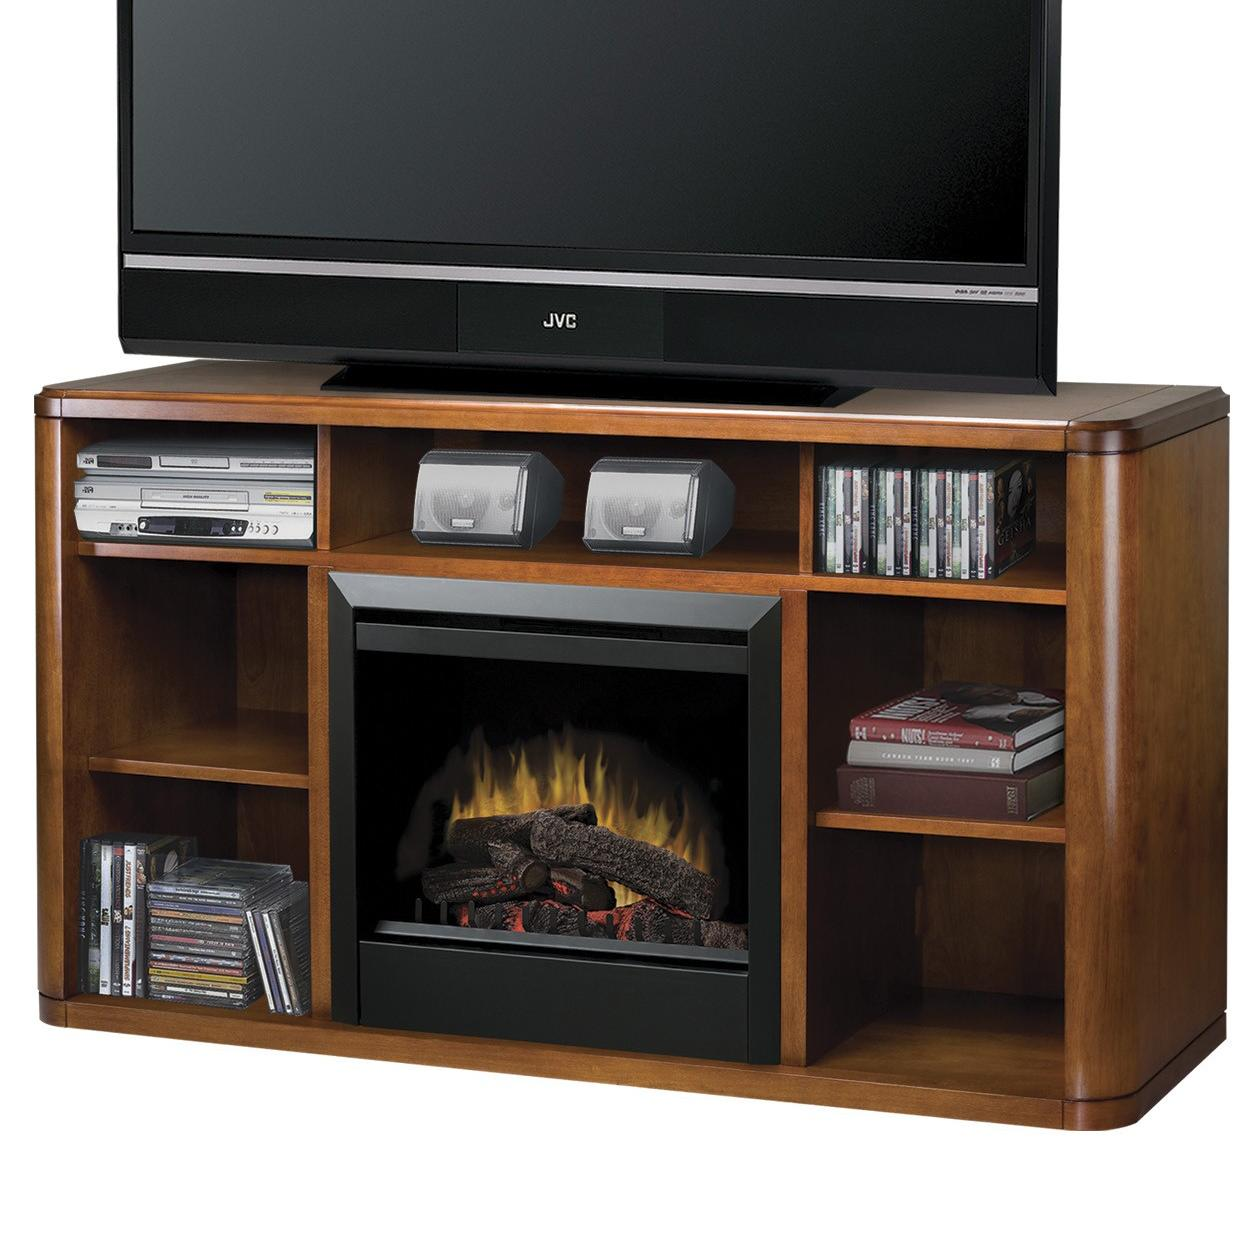 Dimplex Media Console Fireplaces DFP4974BW Logan Media Console Fireplace  Nassau Furniture  TV